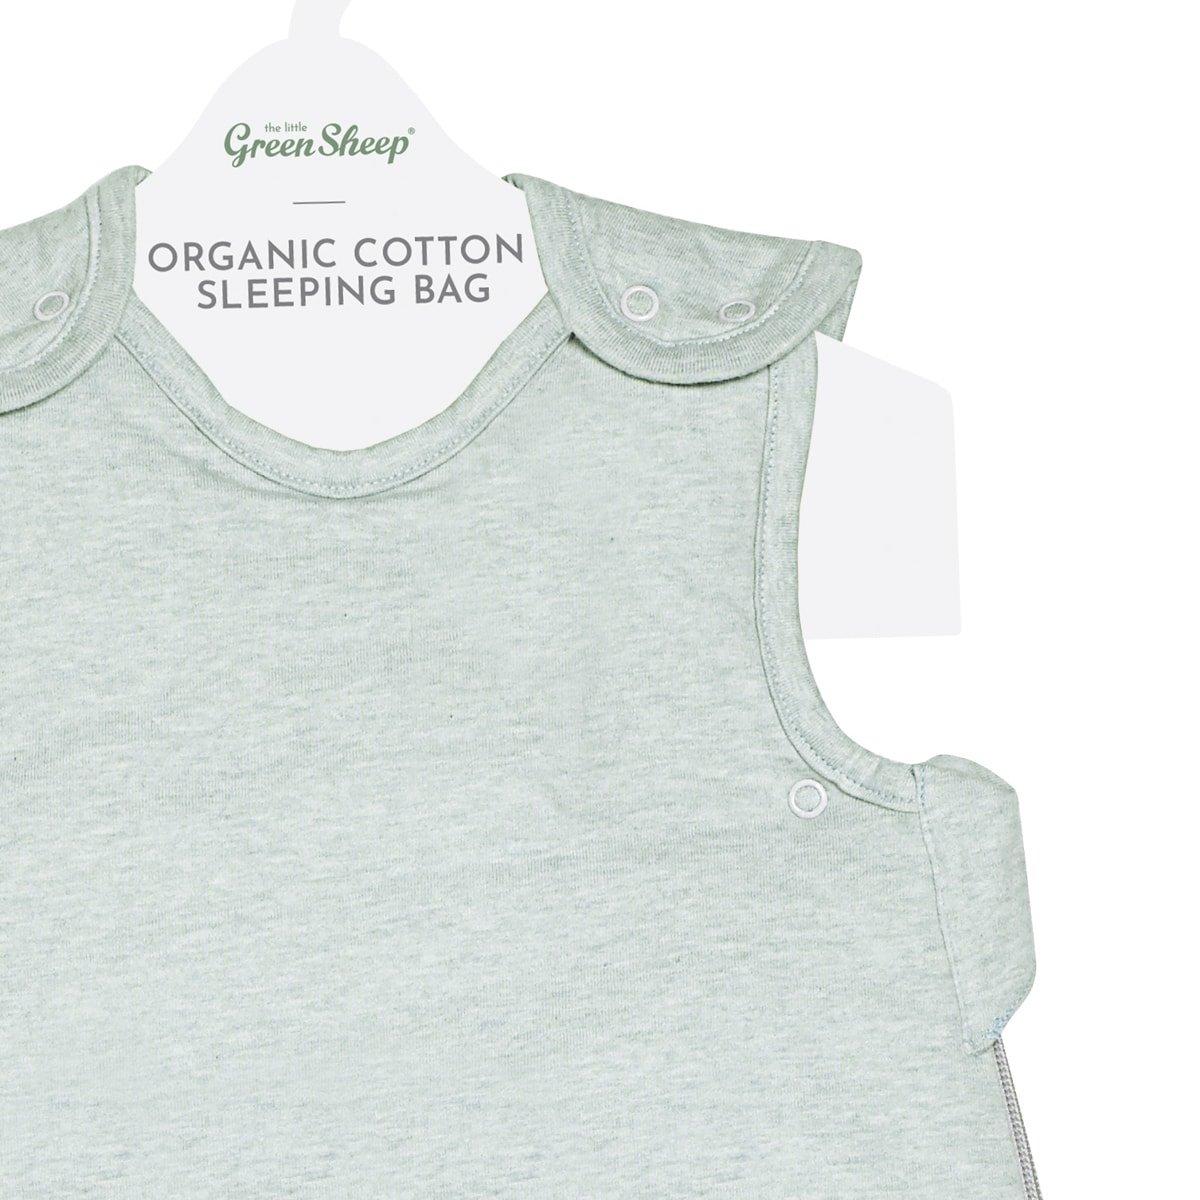 The Little Green Sheep Wild Cotton Organic Sleeping Bag